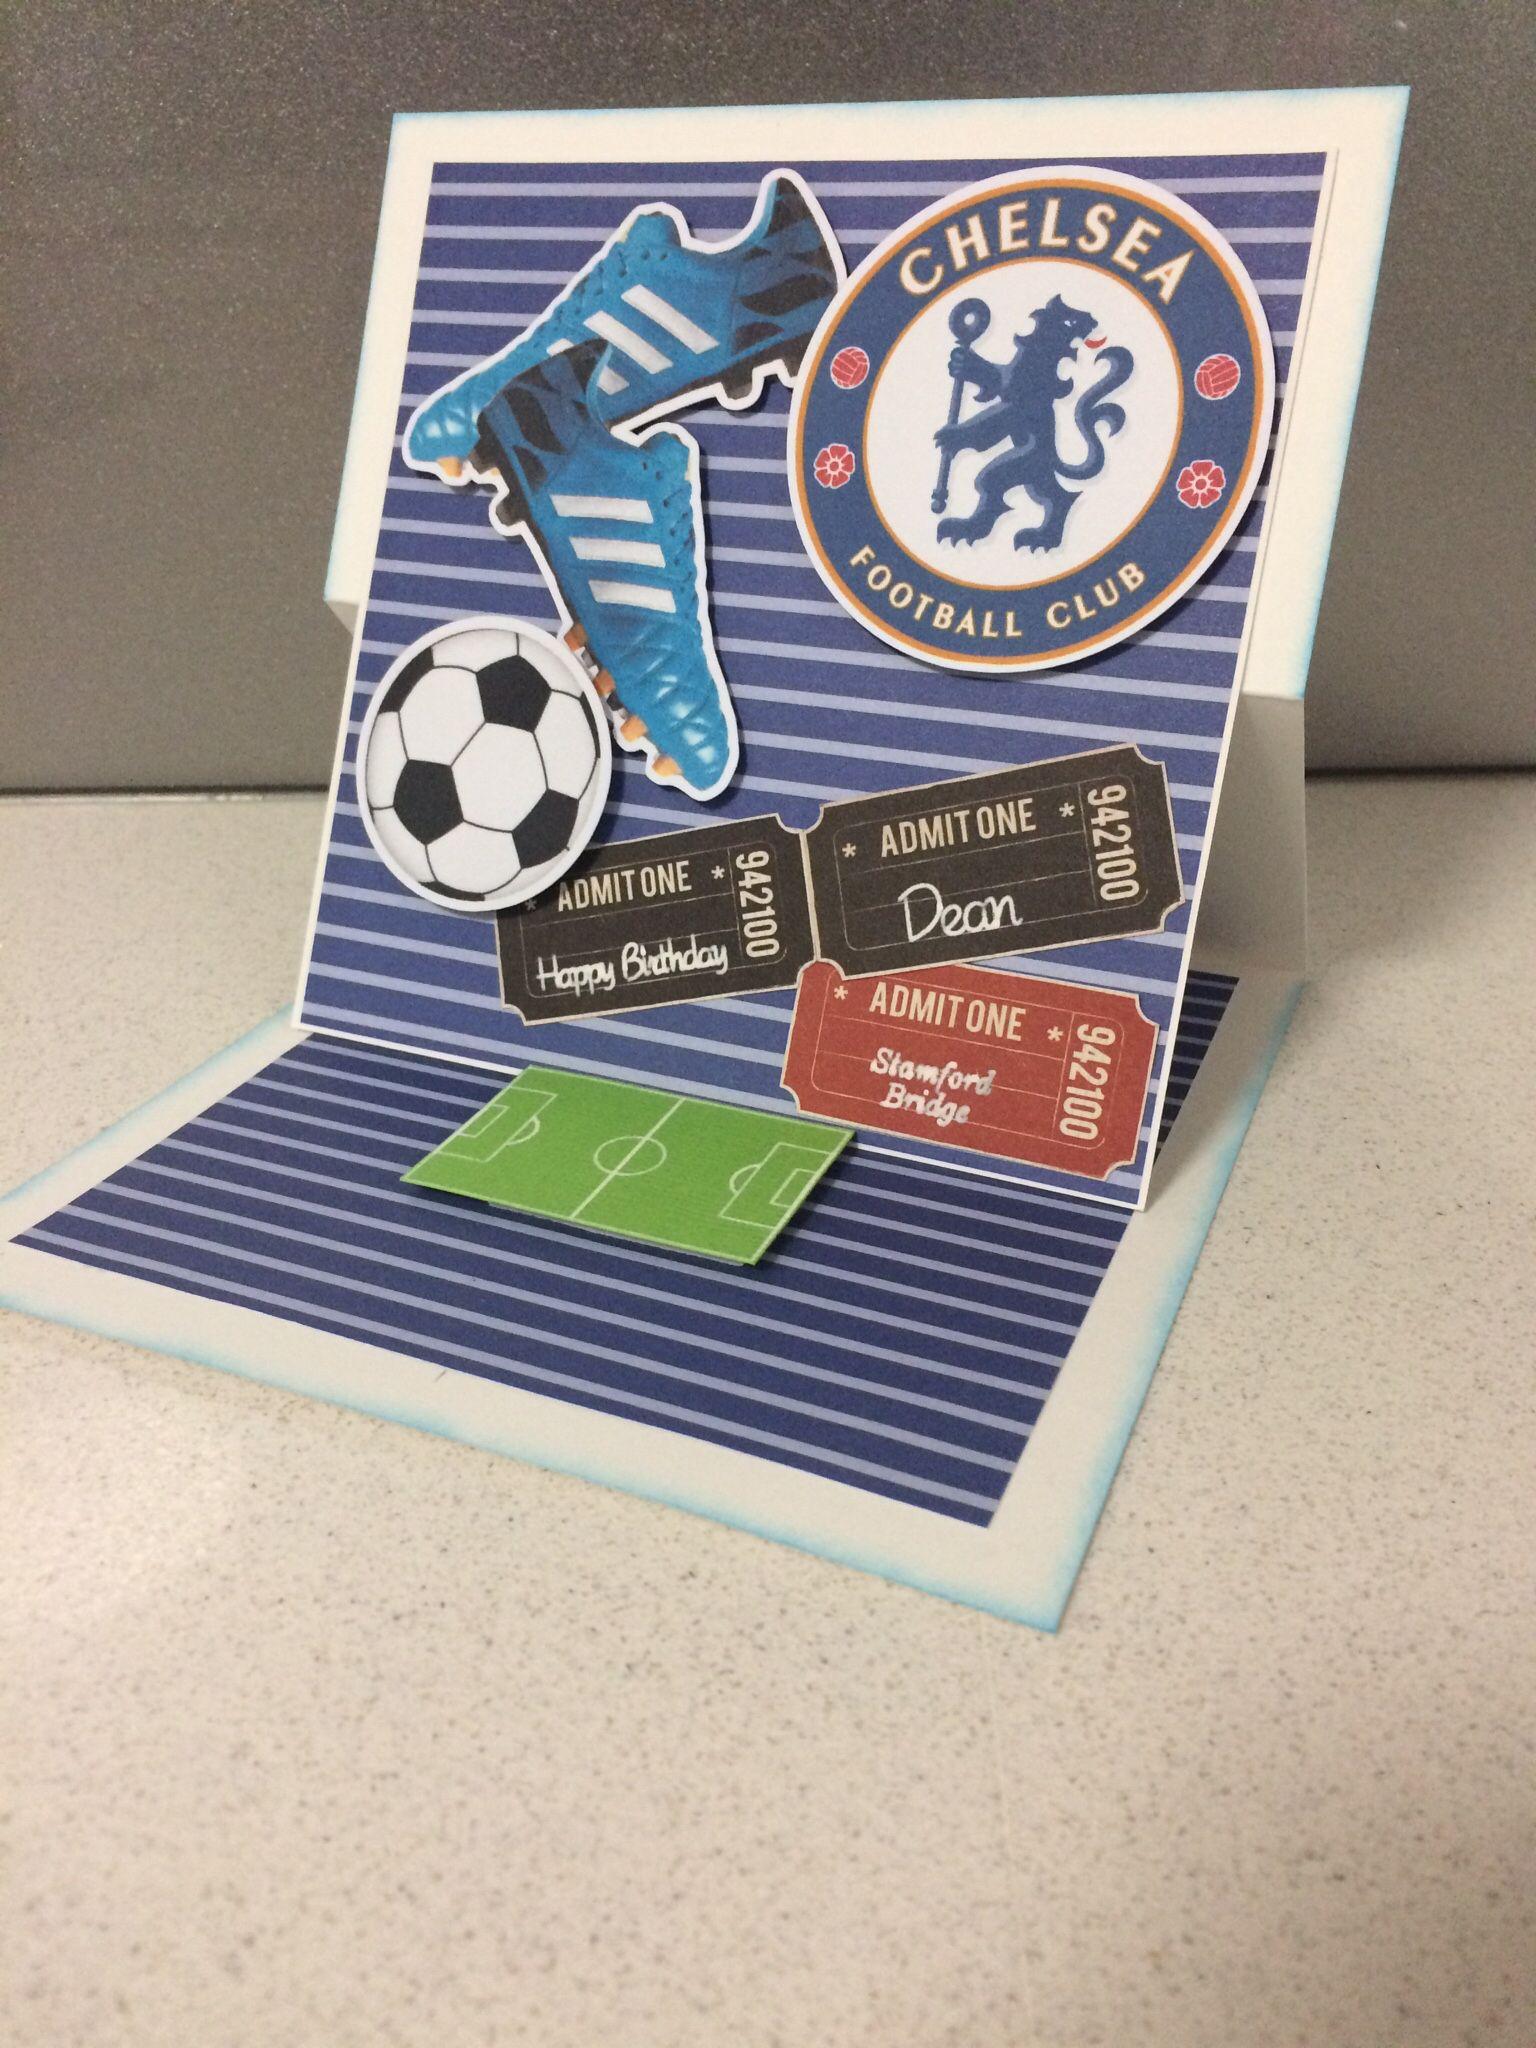 Chelsea Football Club Birthday Card Birthday Cards Diy Birthday Cards Cards Handmade